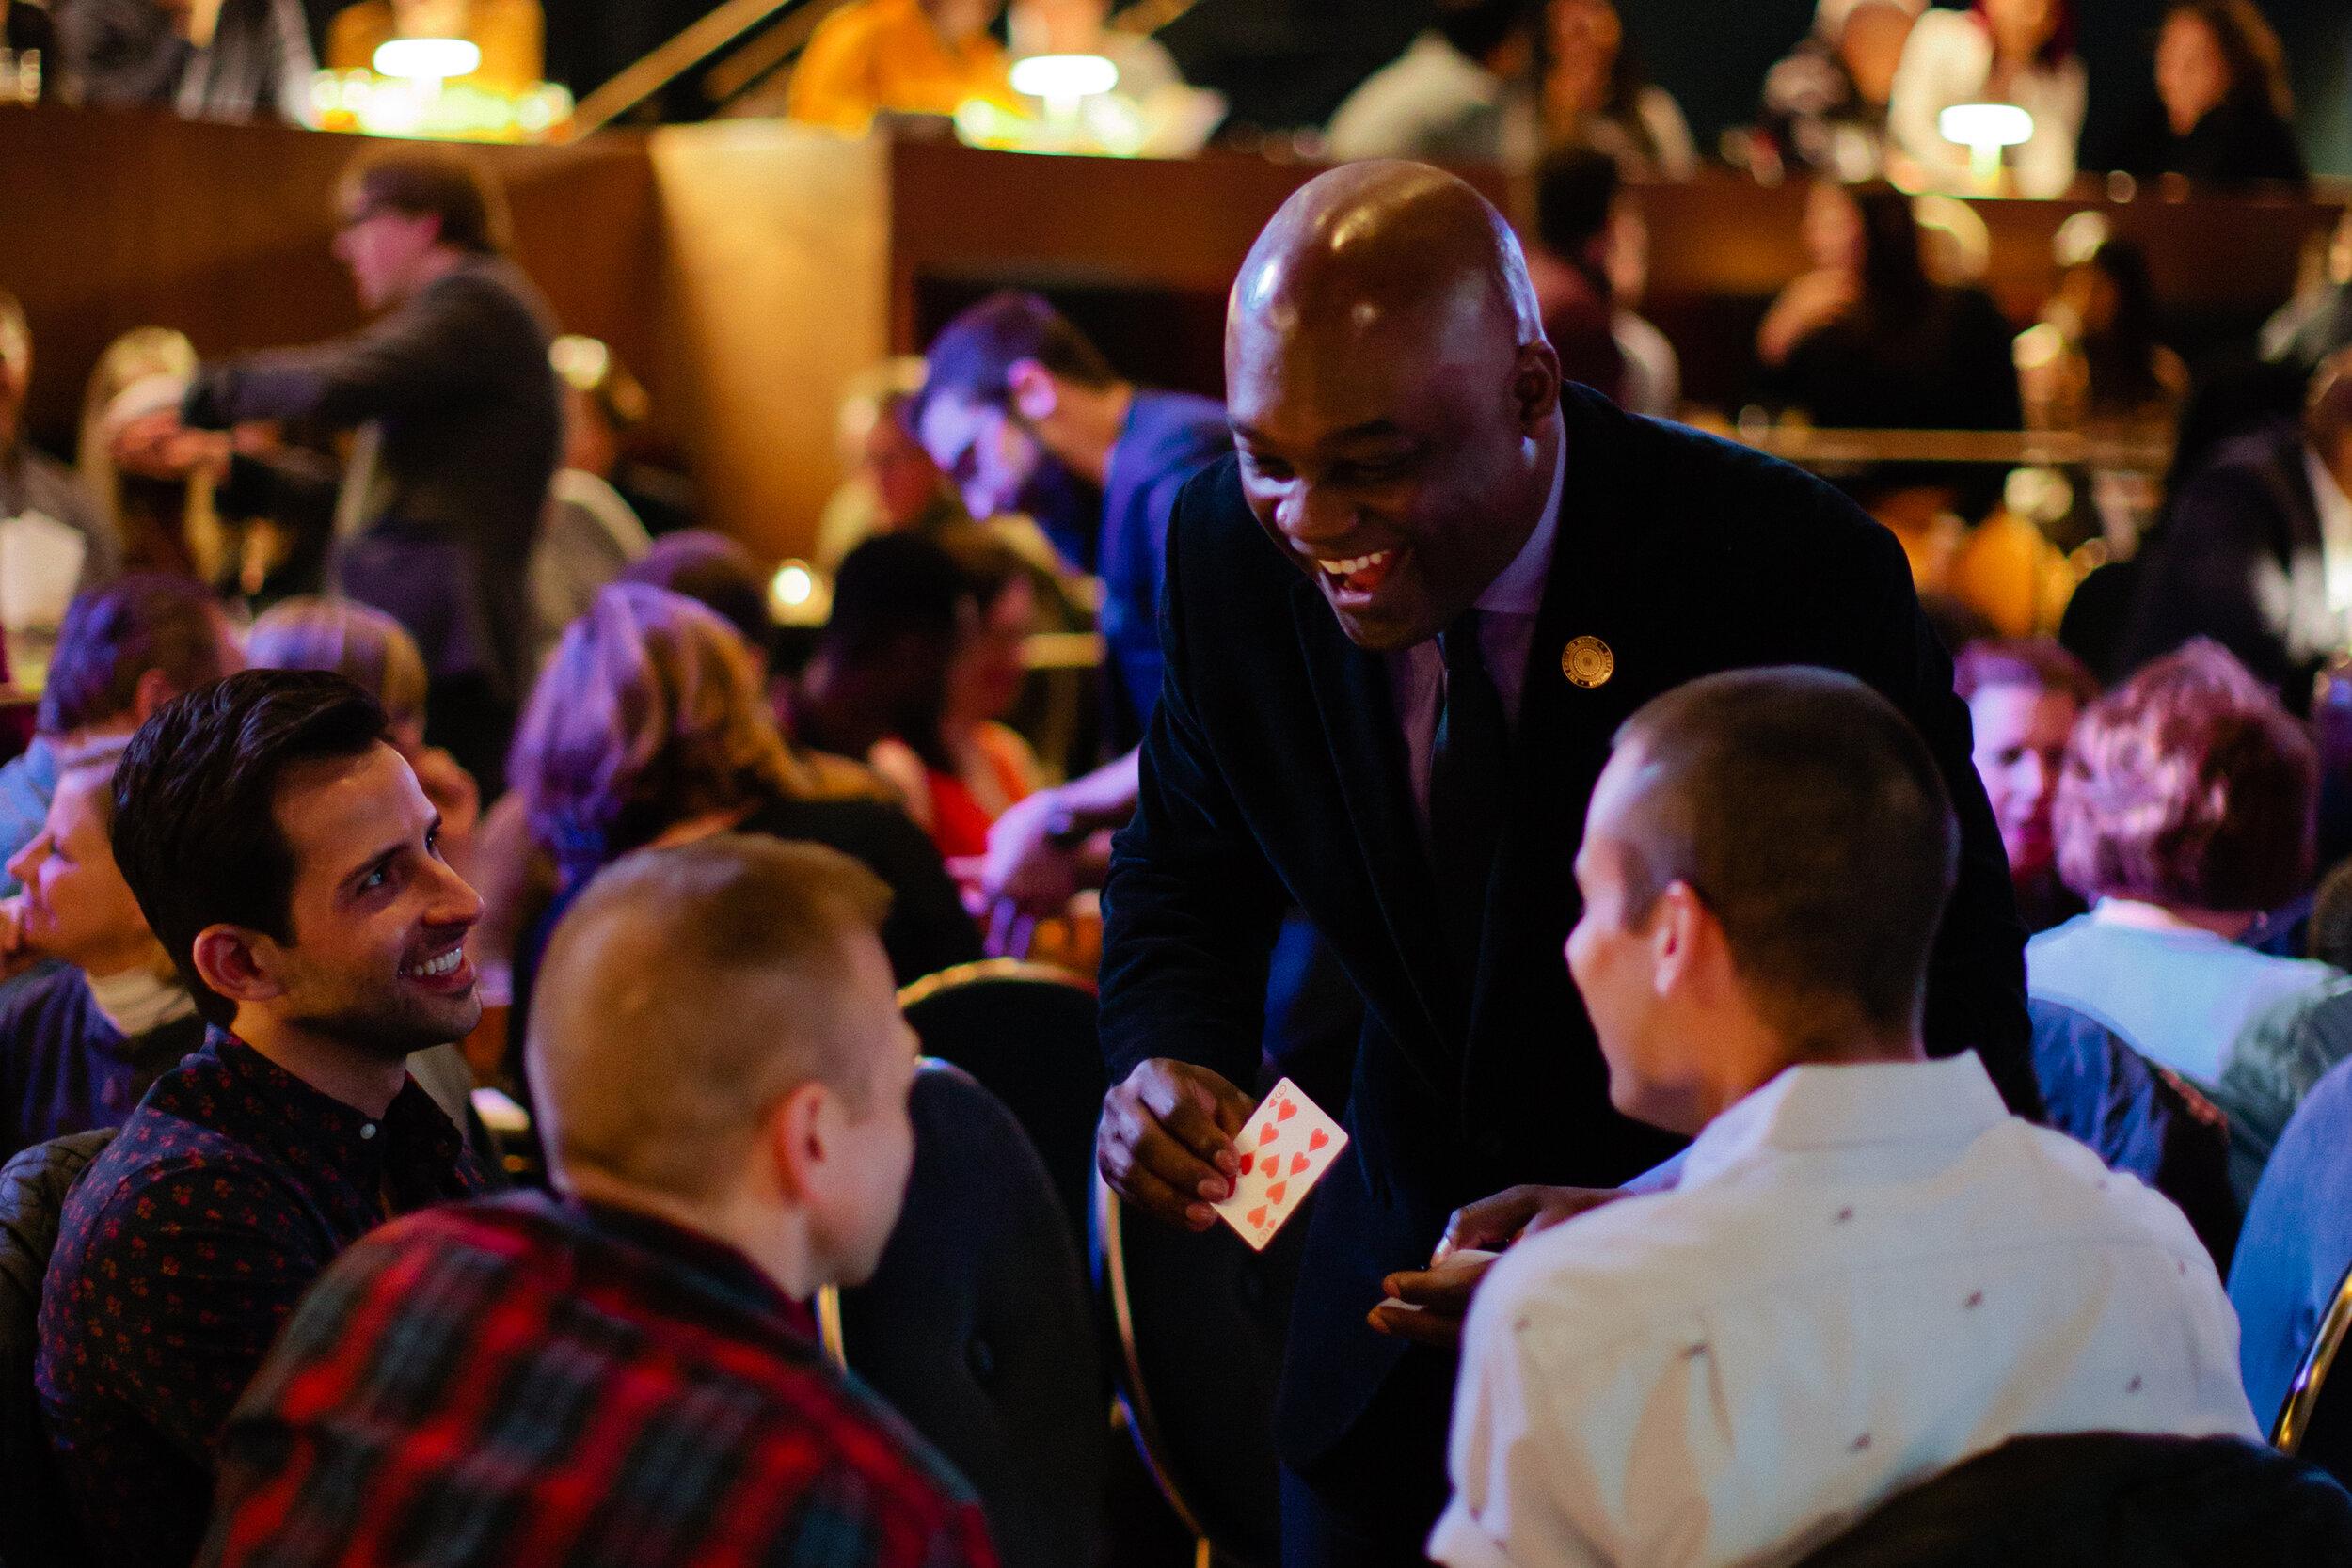 BenjaminBarnes_Chicago_Magic_Lounge_table_magic.JPG